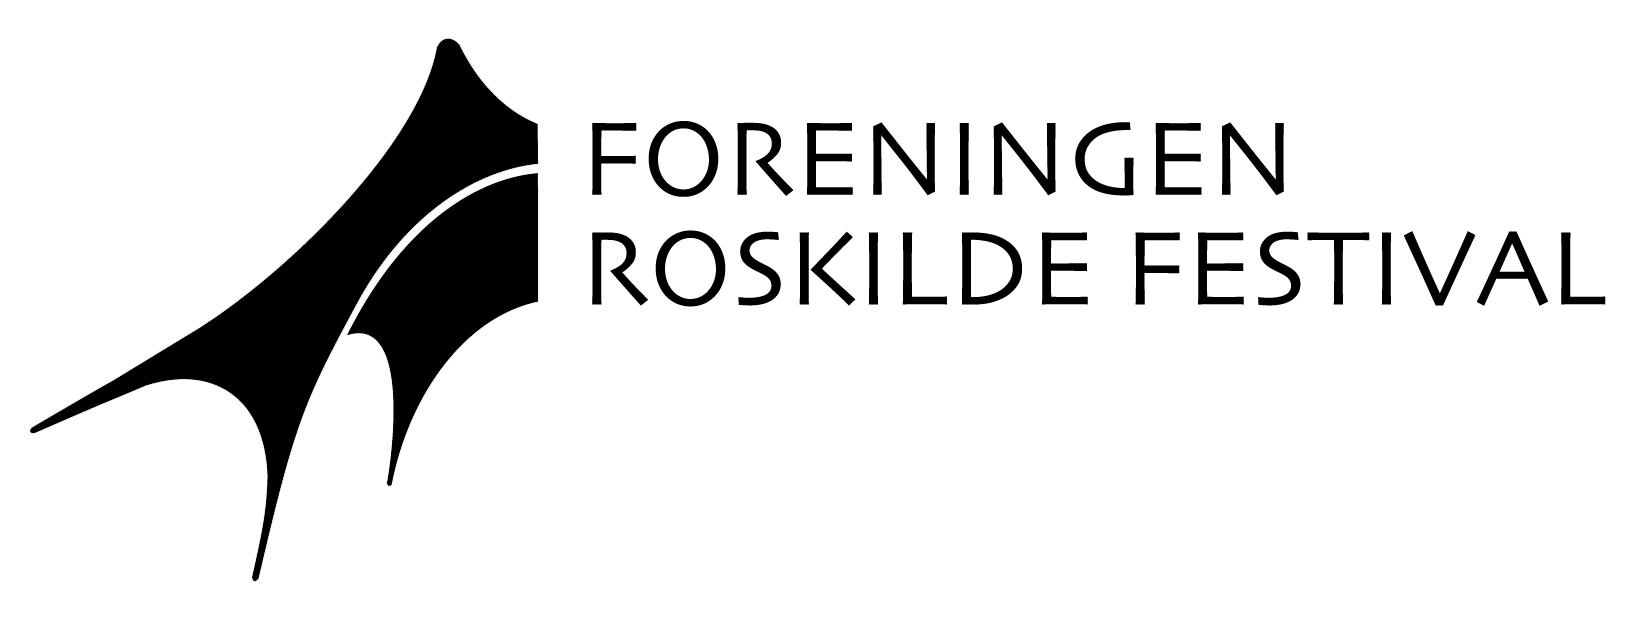 Foreningen_RF_Logo_pos.jpg